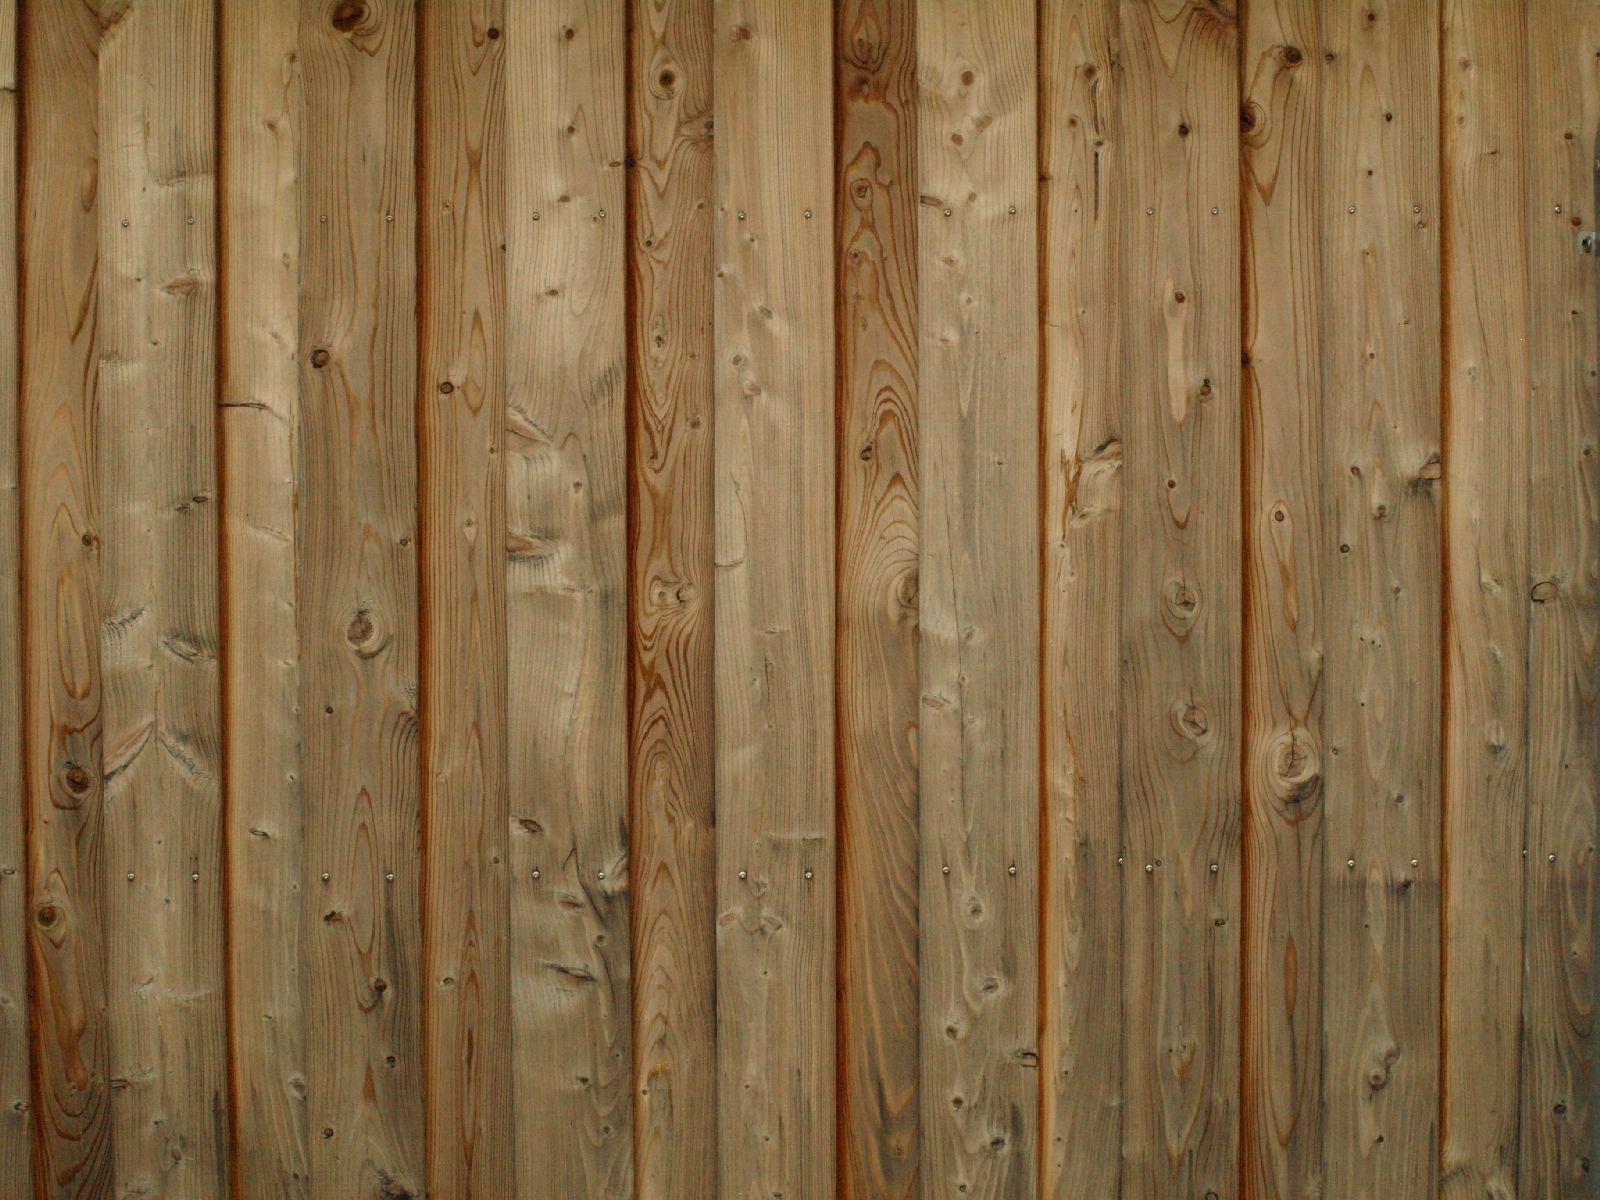 Wood_Texture_A_P4091862